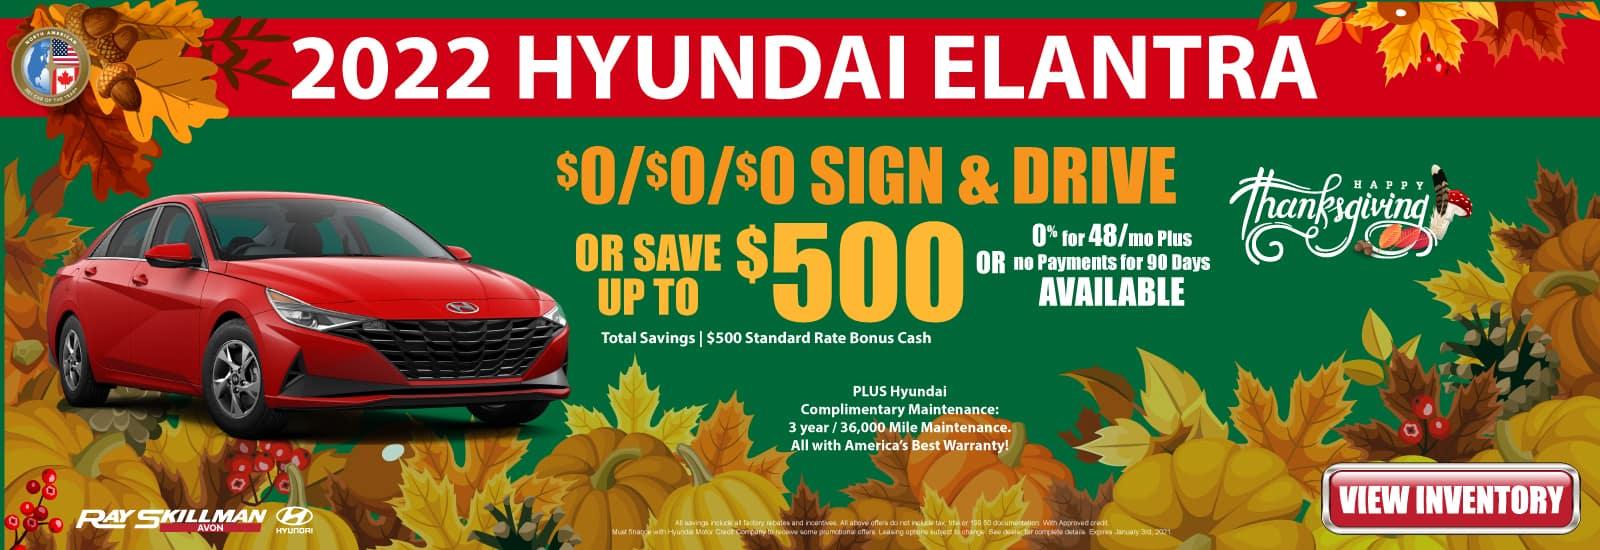 2022-Hyundai-Elantra-Web-Banner-1600×550